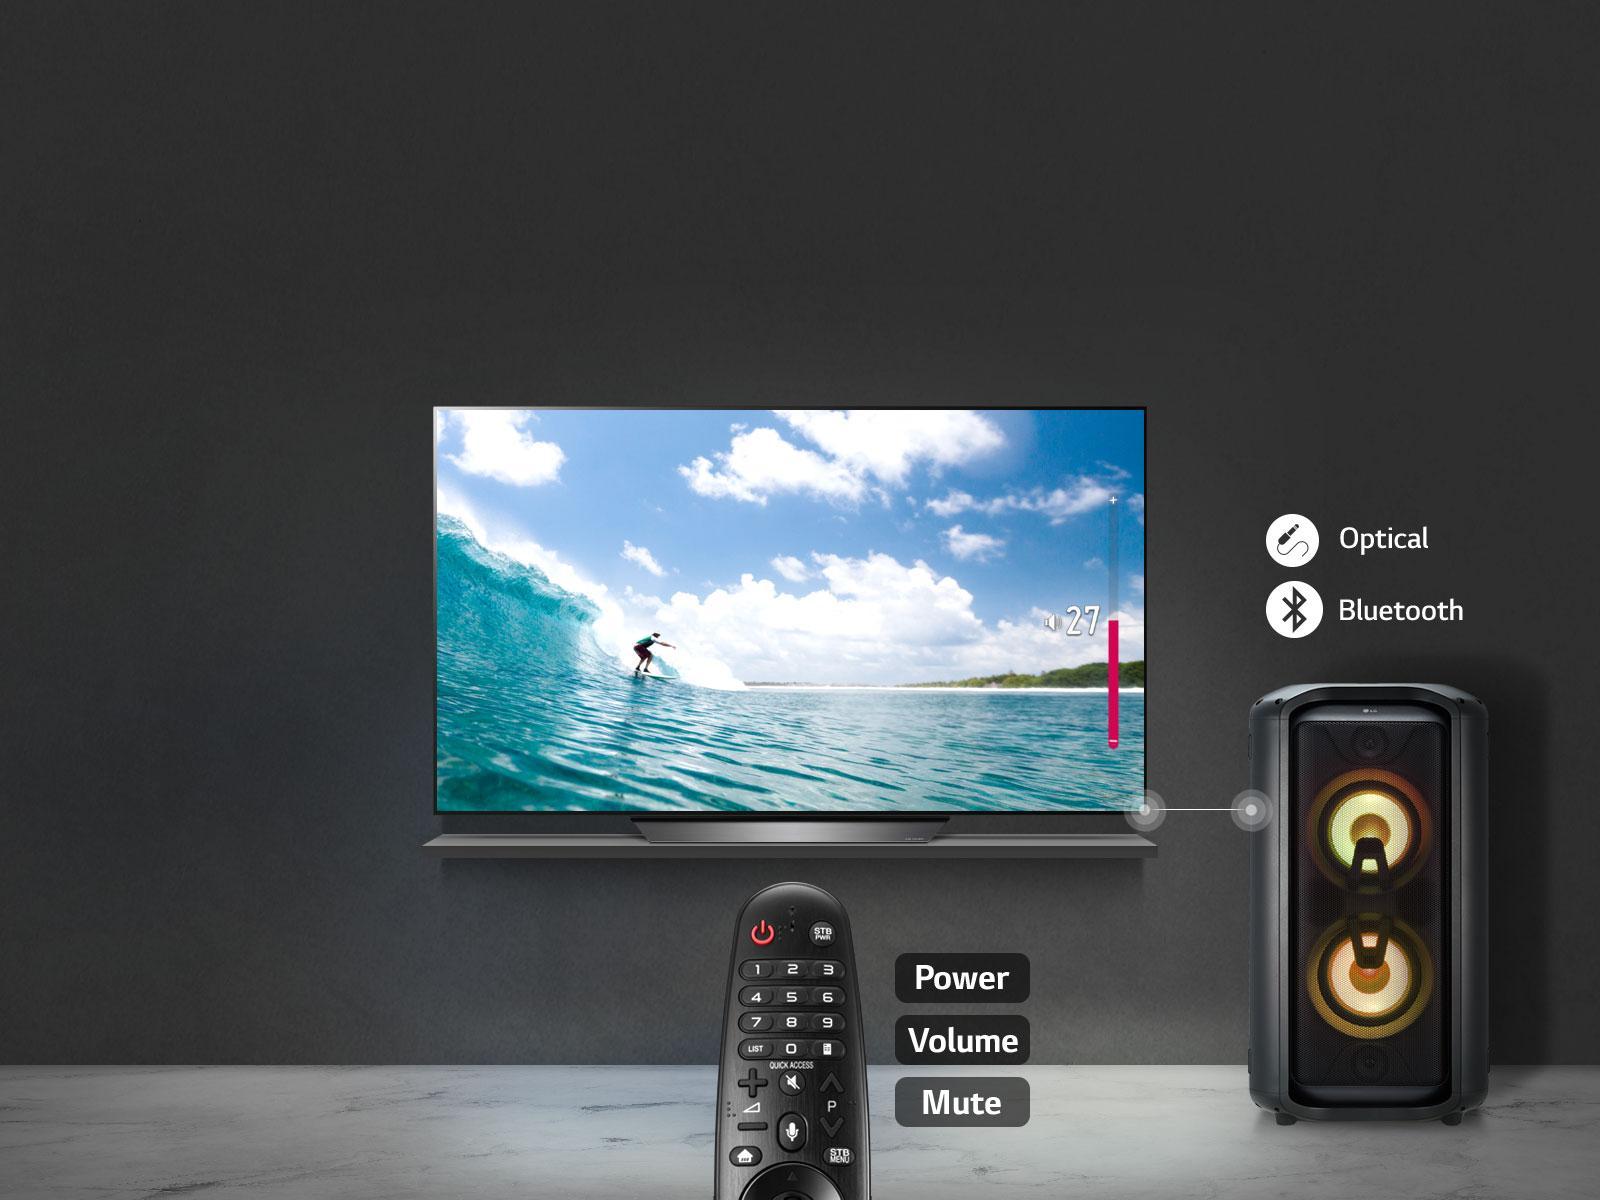 Lg Tv Volume Control On Tv